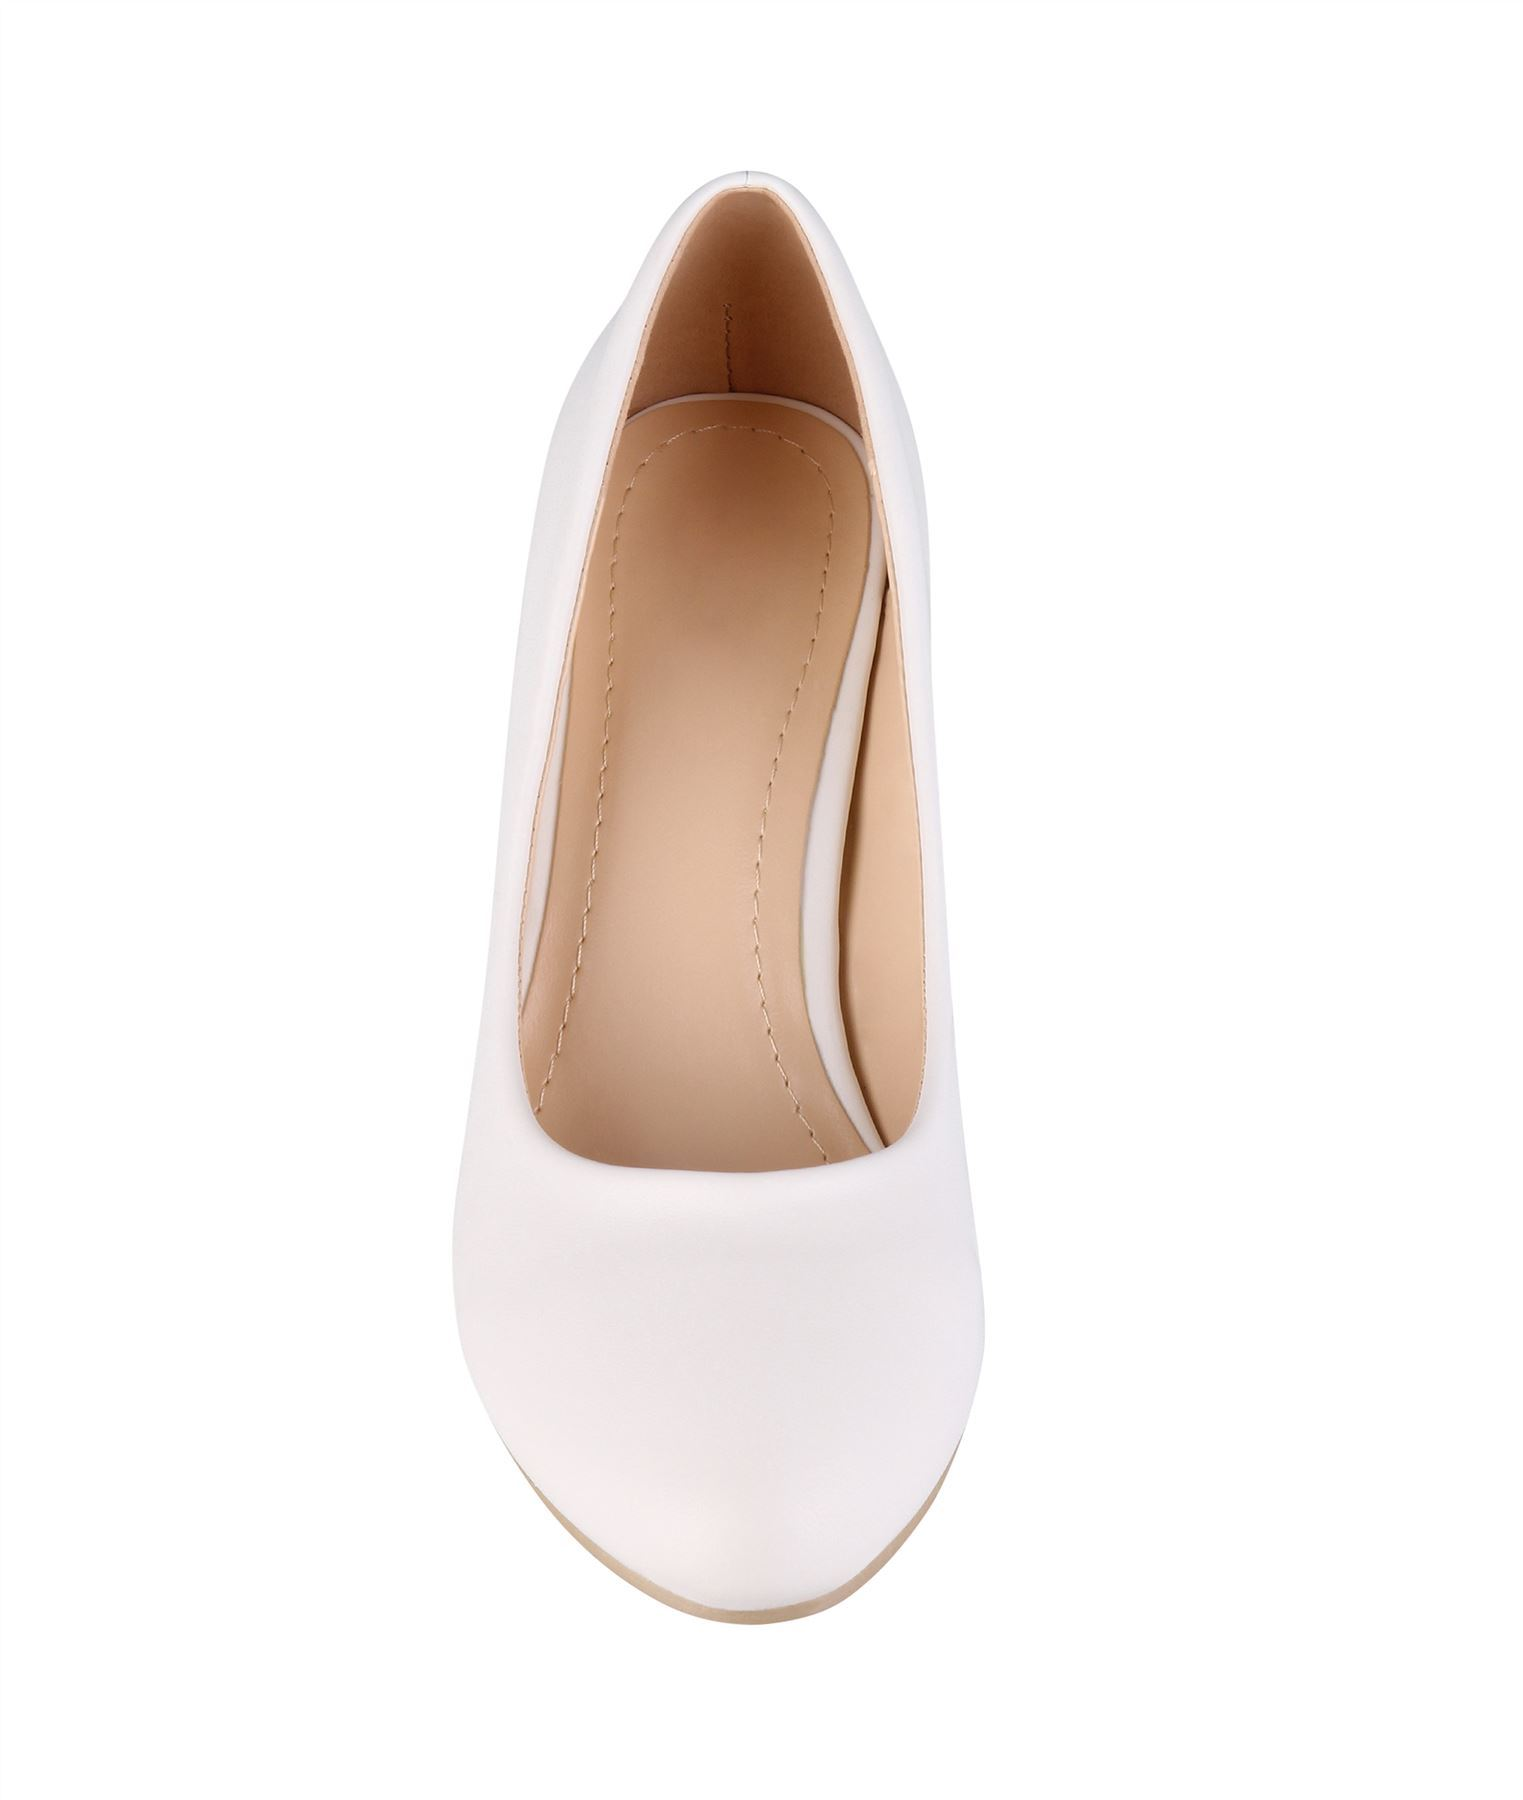 Womens-Ladies-Mid-Heel-Court-Shoes-Slip-On-Low-Kitten-Heels-Pumps-Matte-Size-3-8 thumbnail 24